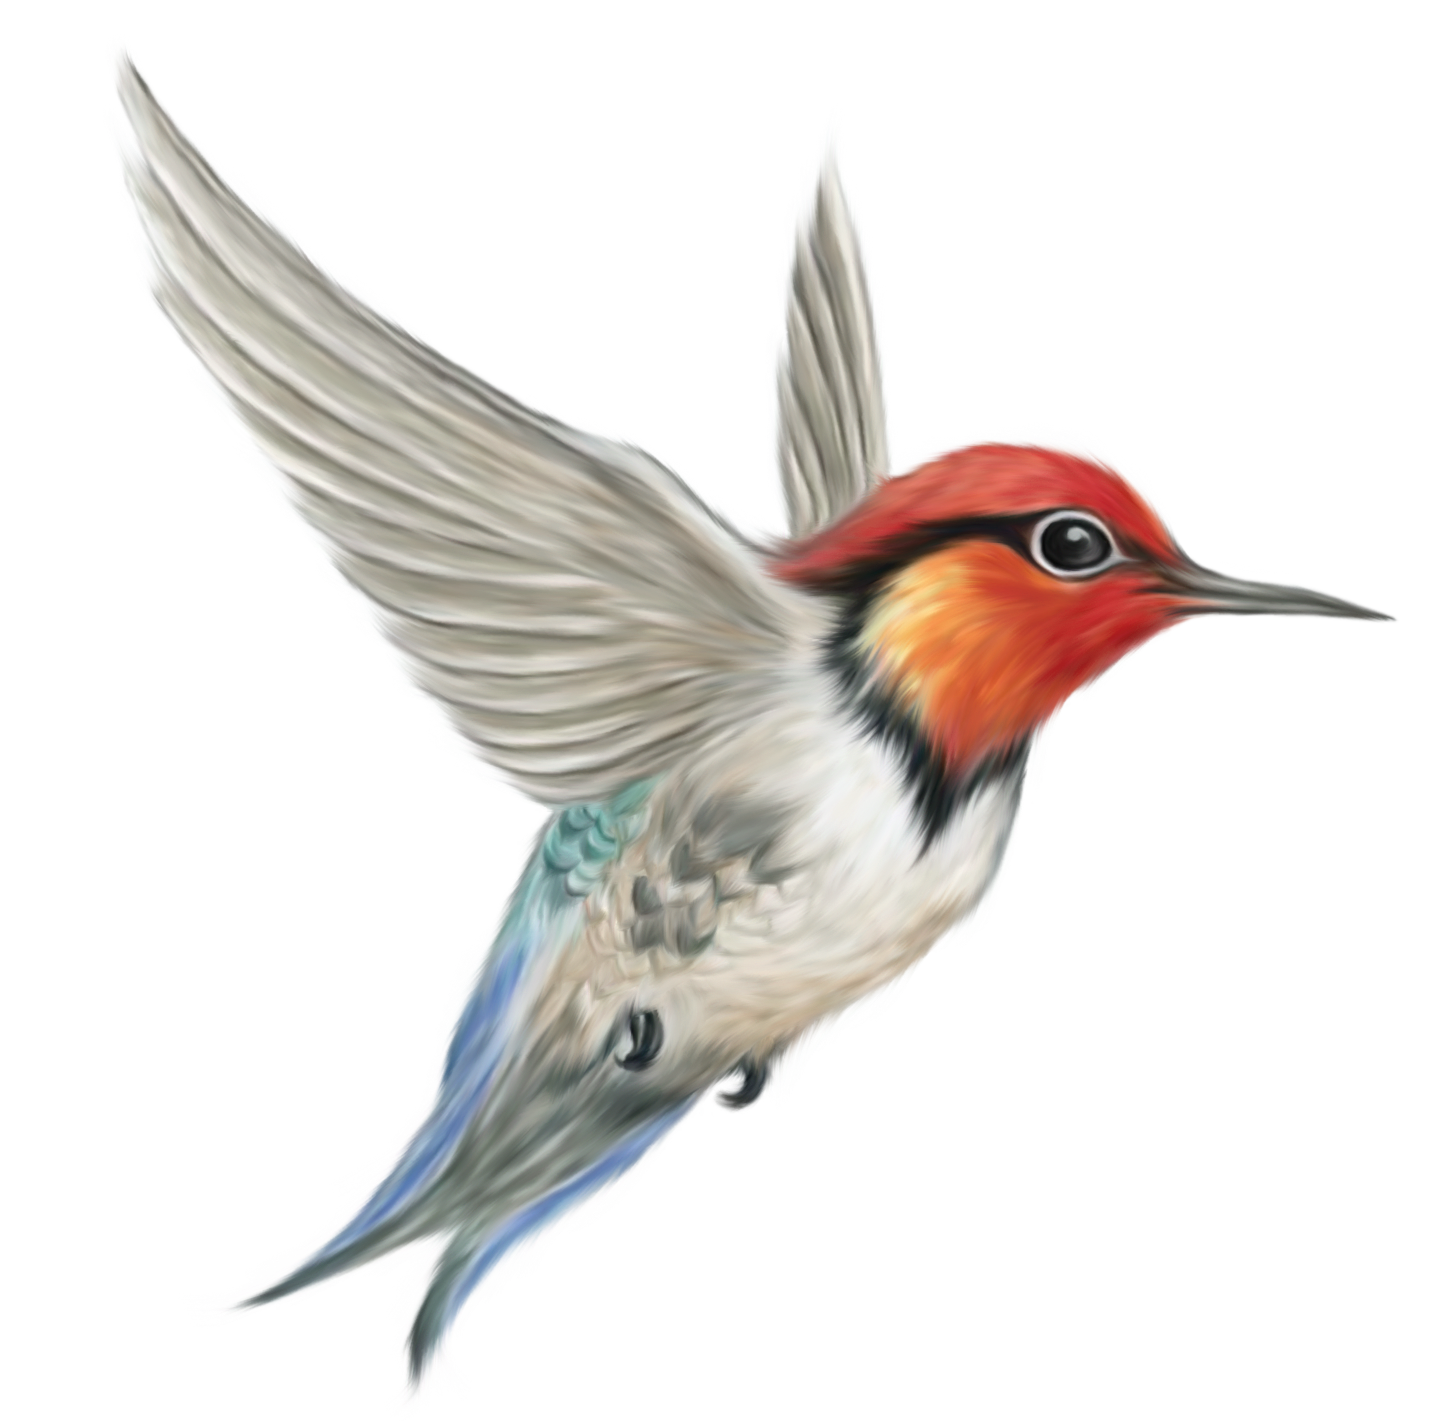 Hummingbird clipart anna's hummingbird. Images yahoo image search